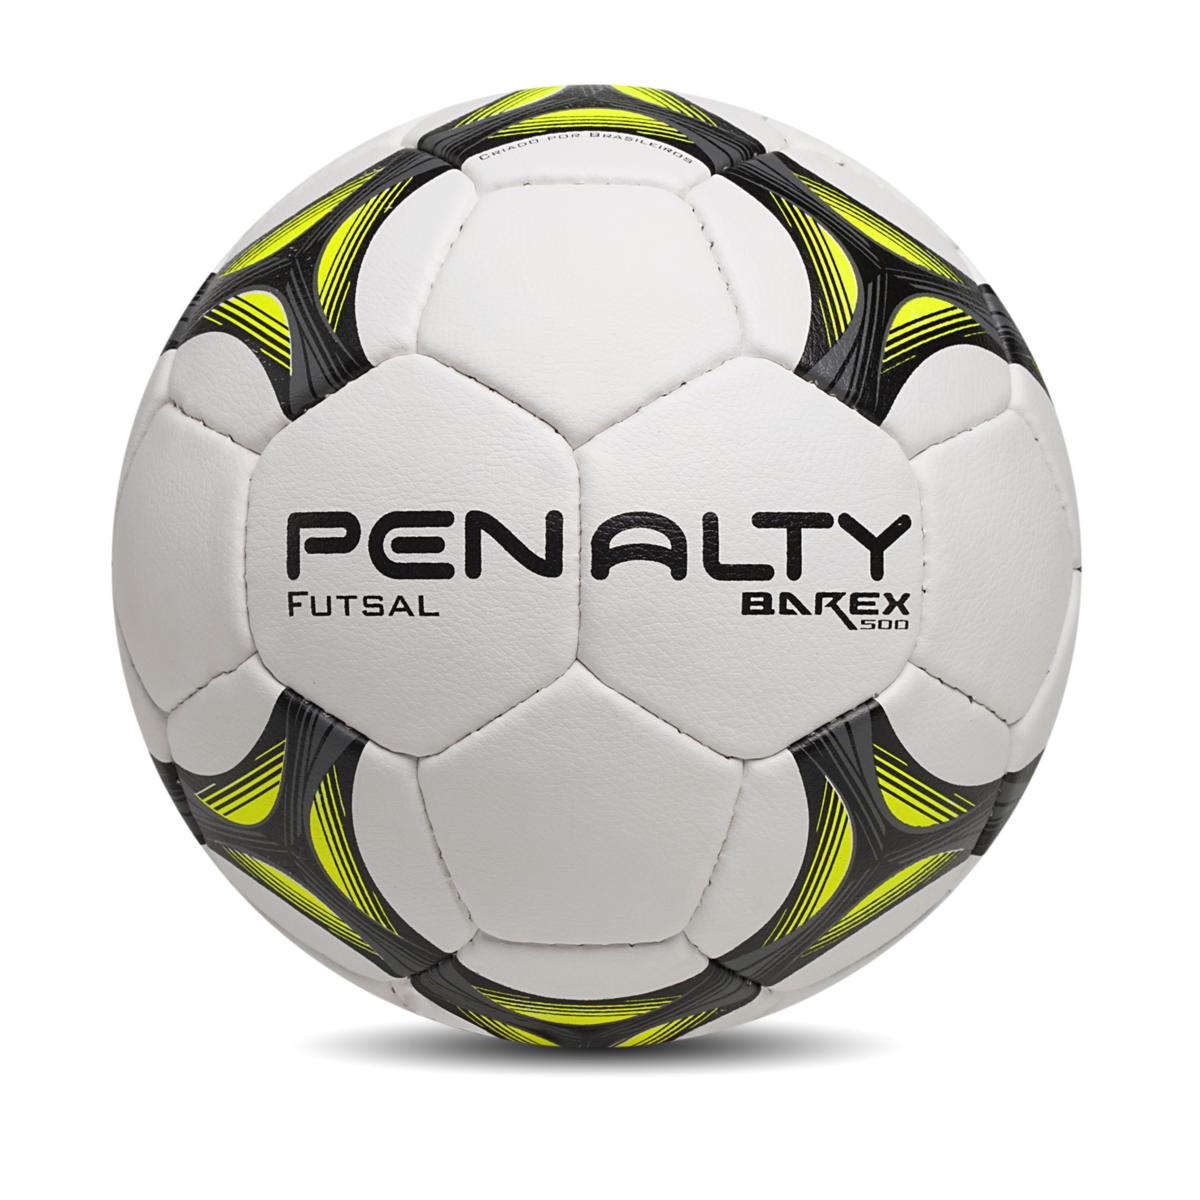 062be92fff Bola Futsal Penalty Barex 500 510836-1875 Branco Verde Limão